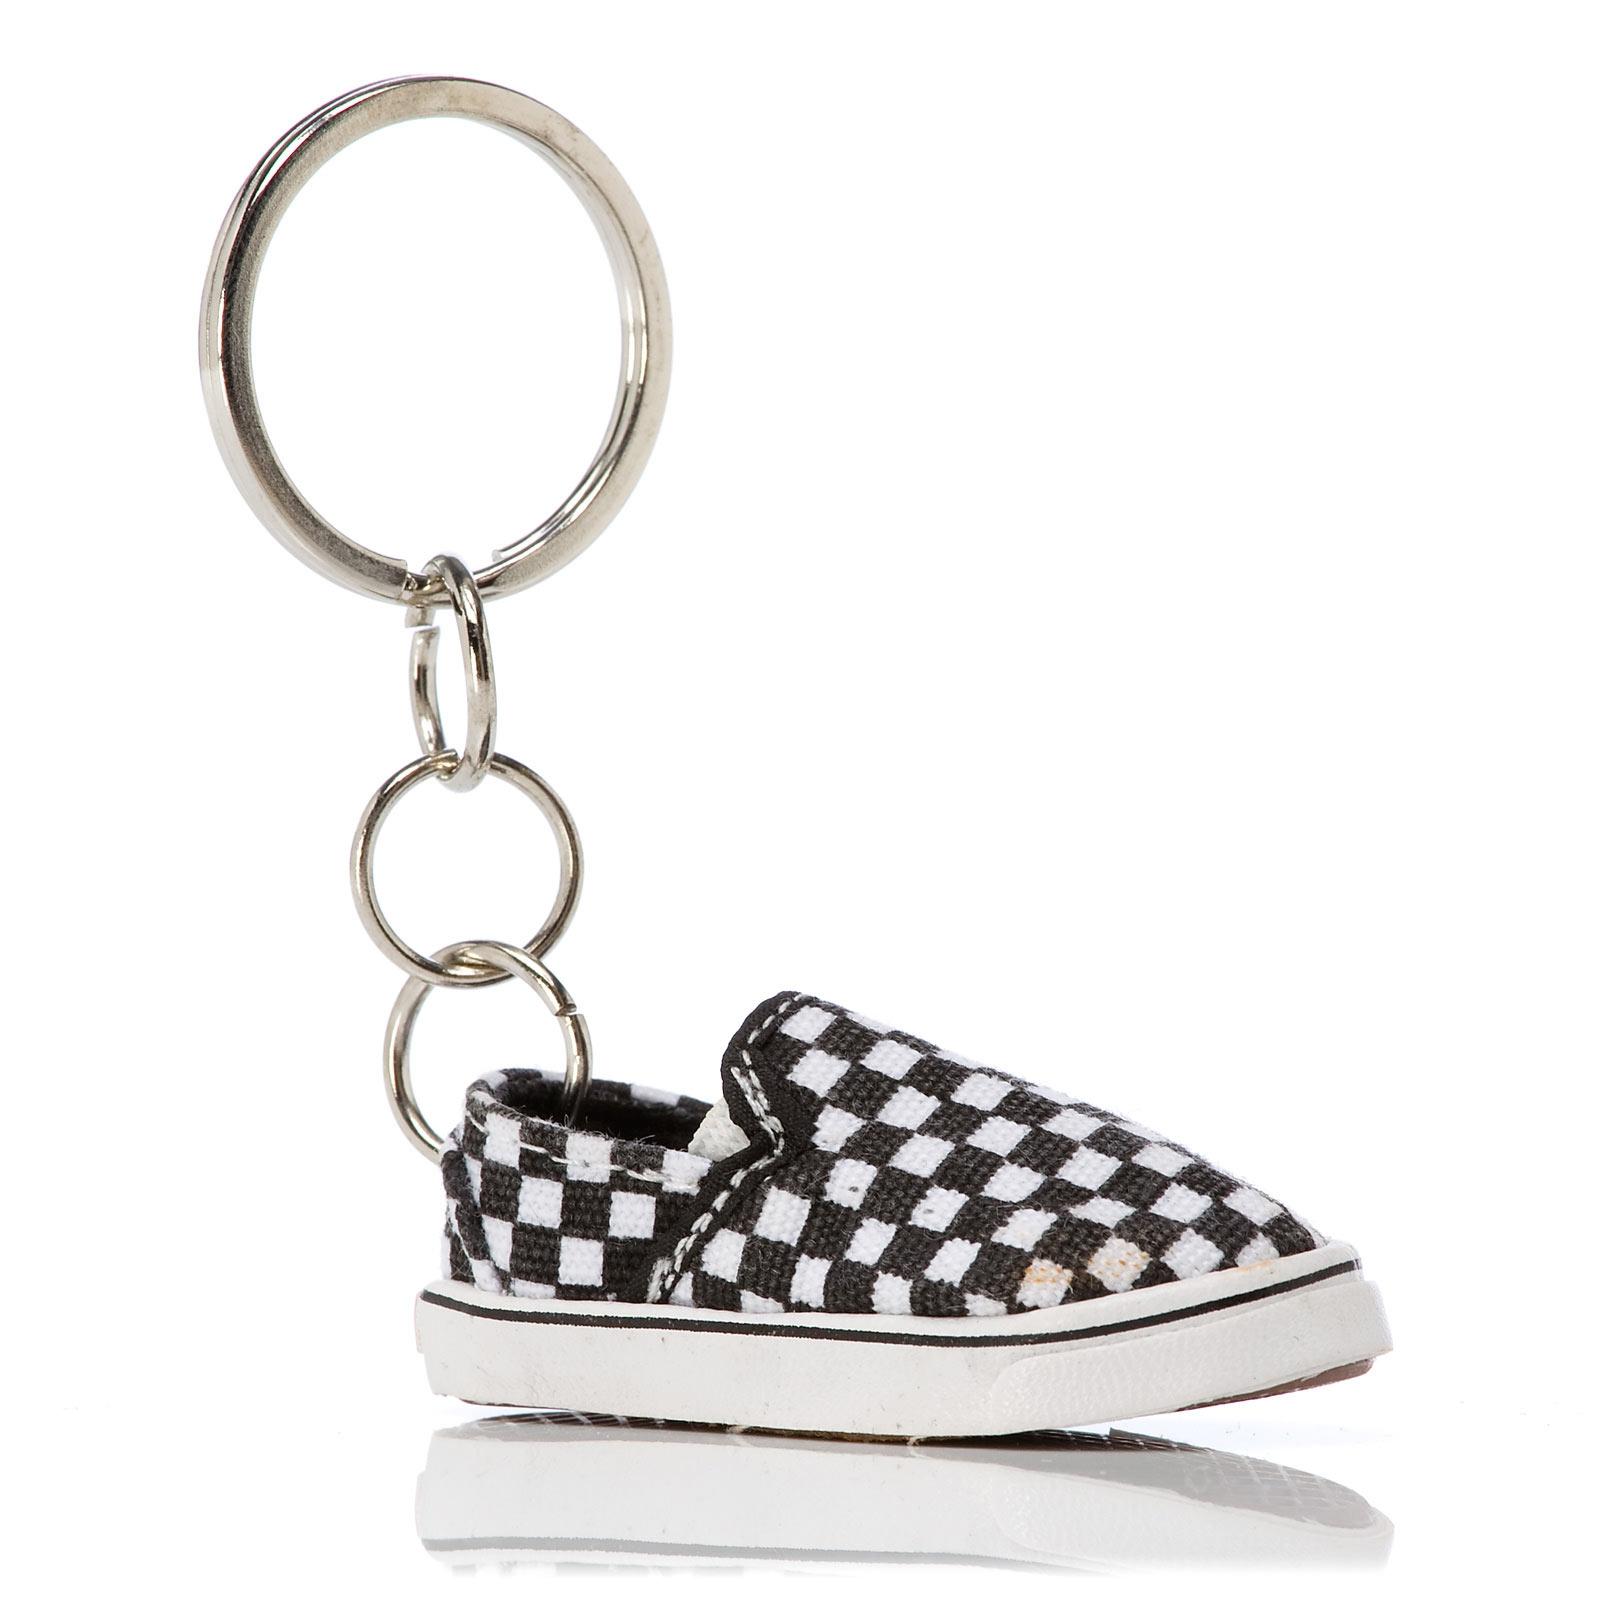 Vans Slip-On Keychain black/white